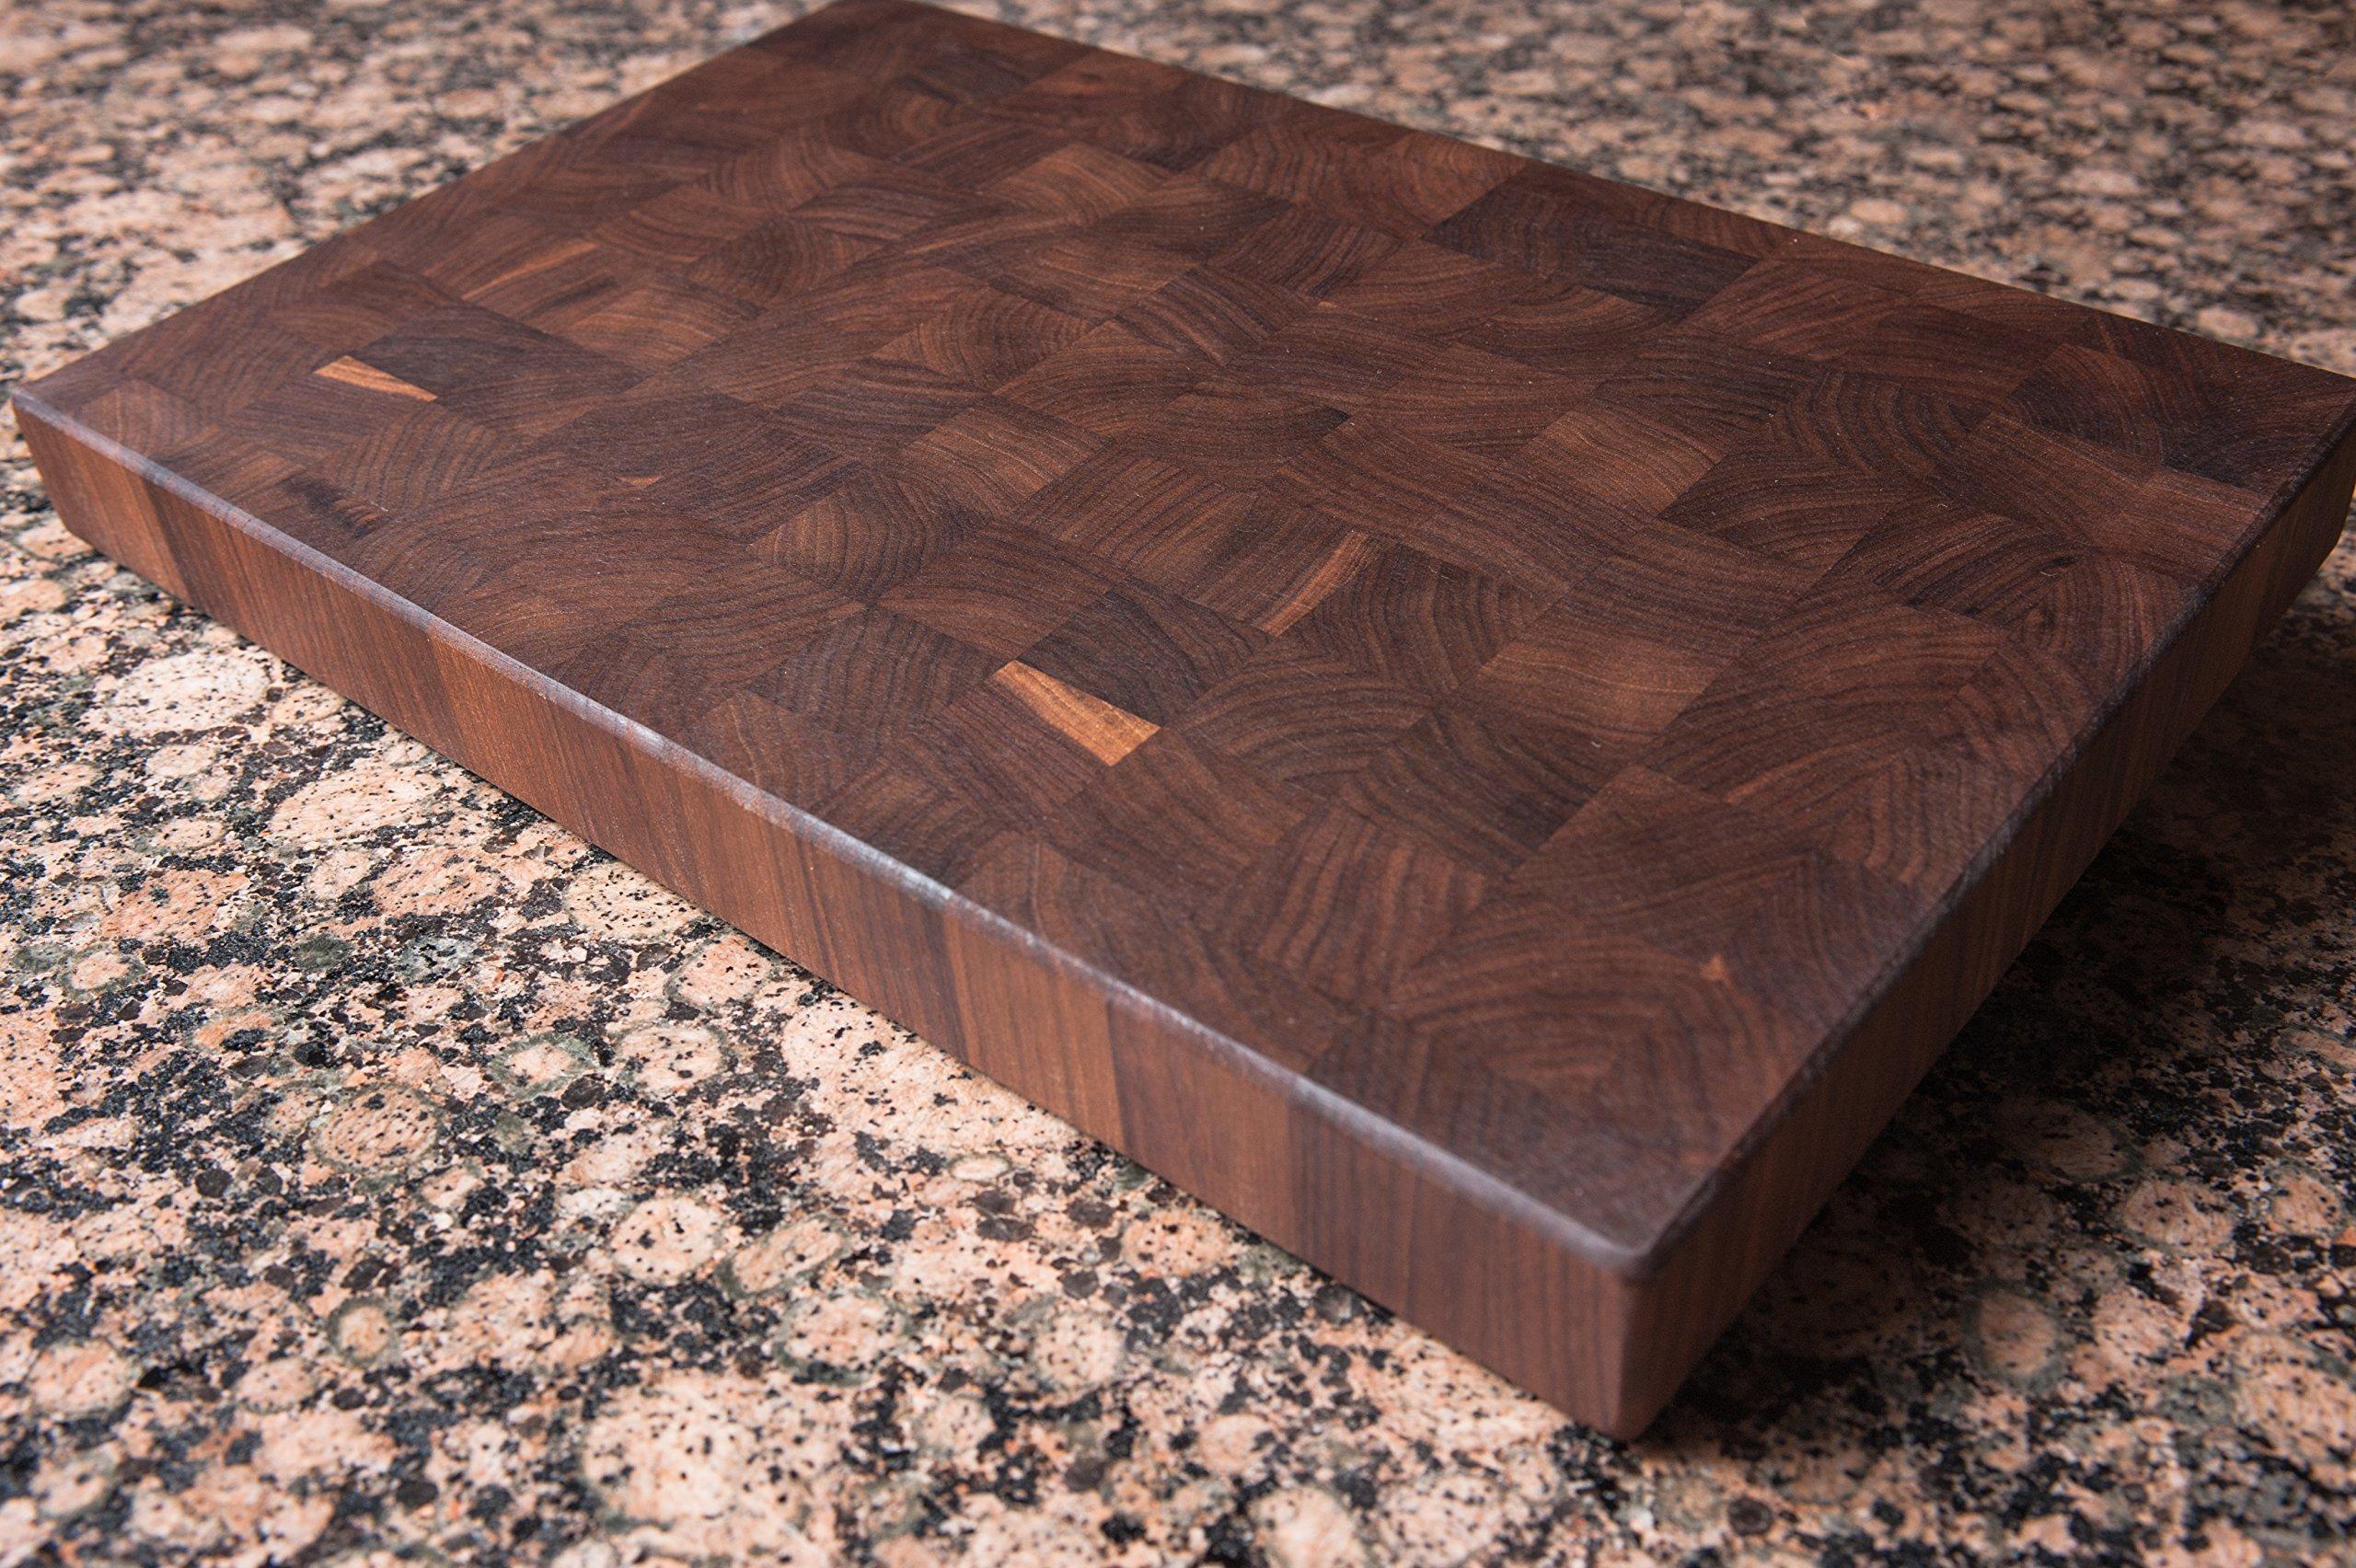 Chopping Blox Walnut End Grain Handmade Wood Cutting Board Large - (TRXM)